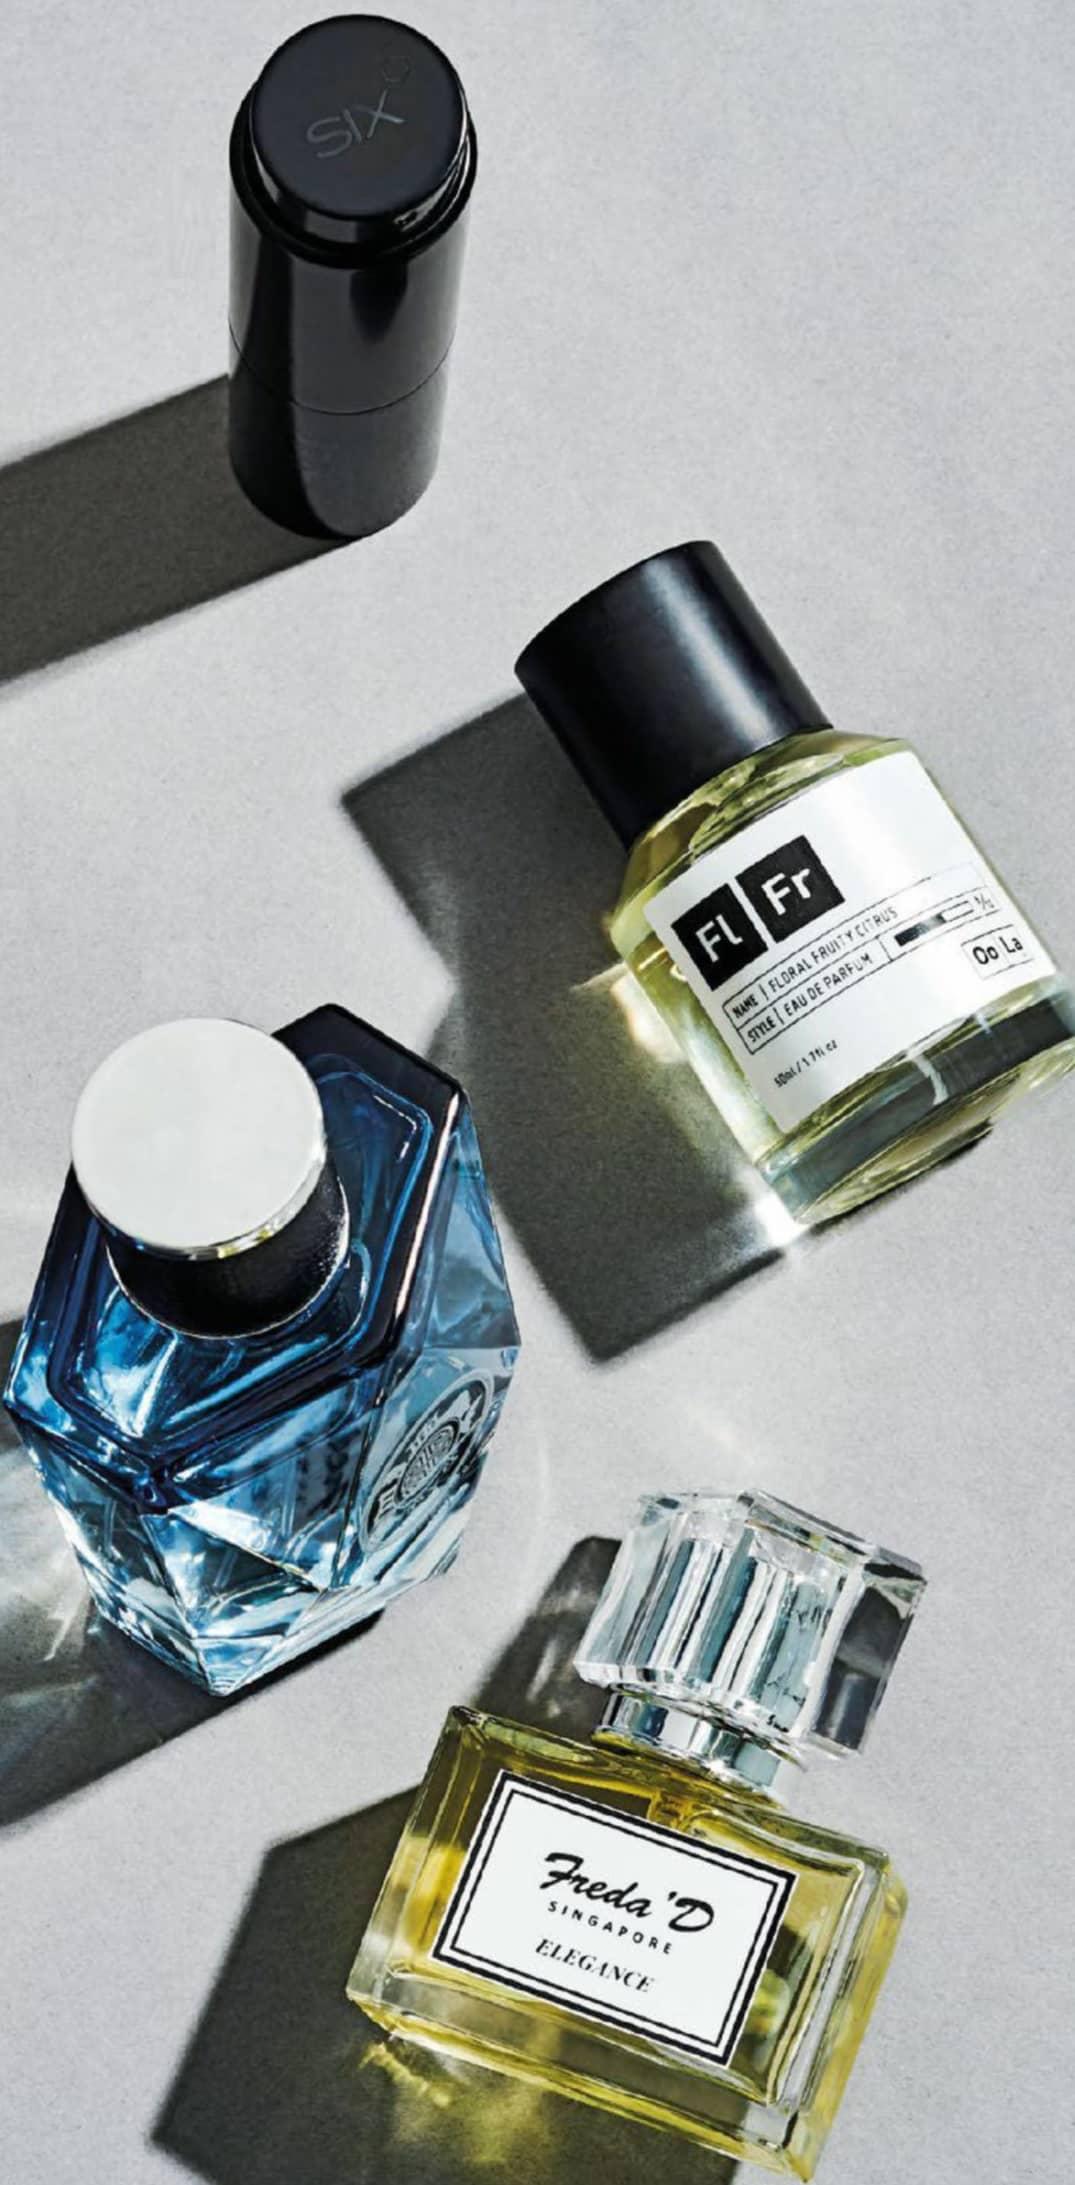 Home-Grown Artisanal Fragrances Worth A Whiff